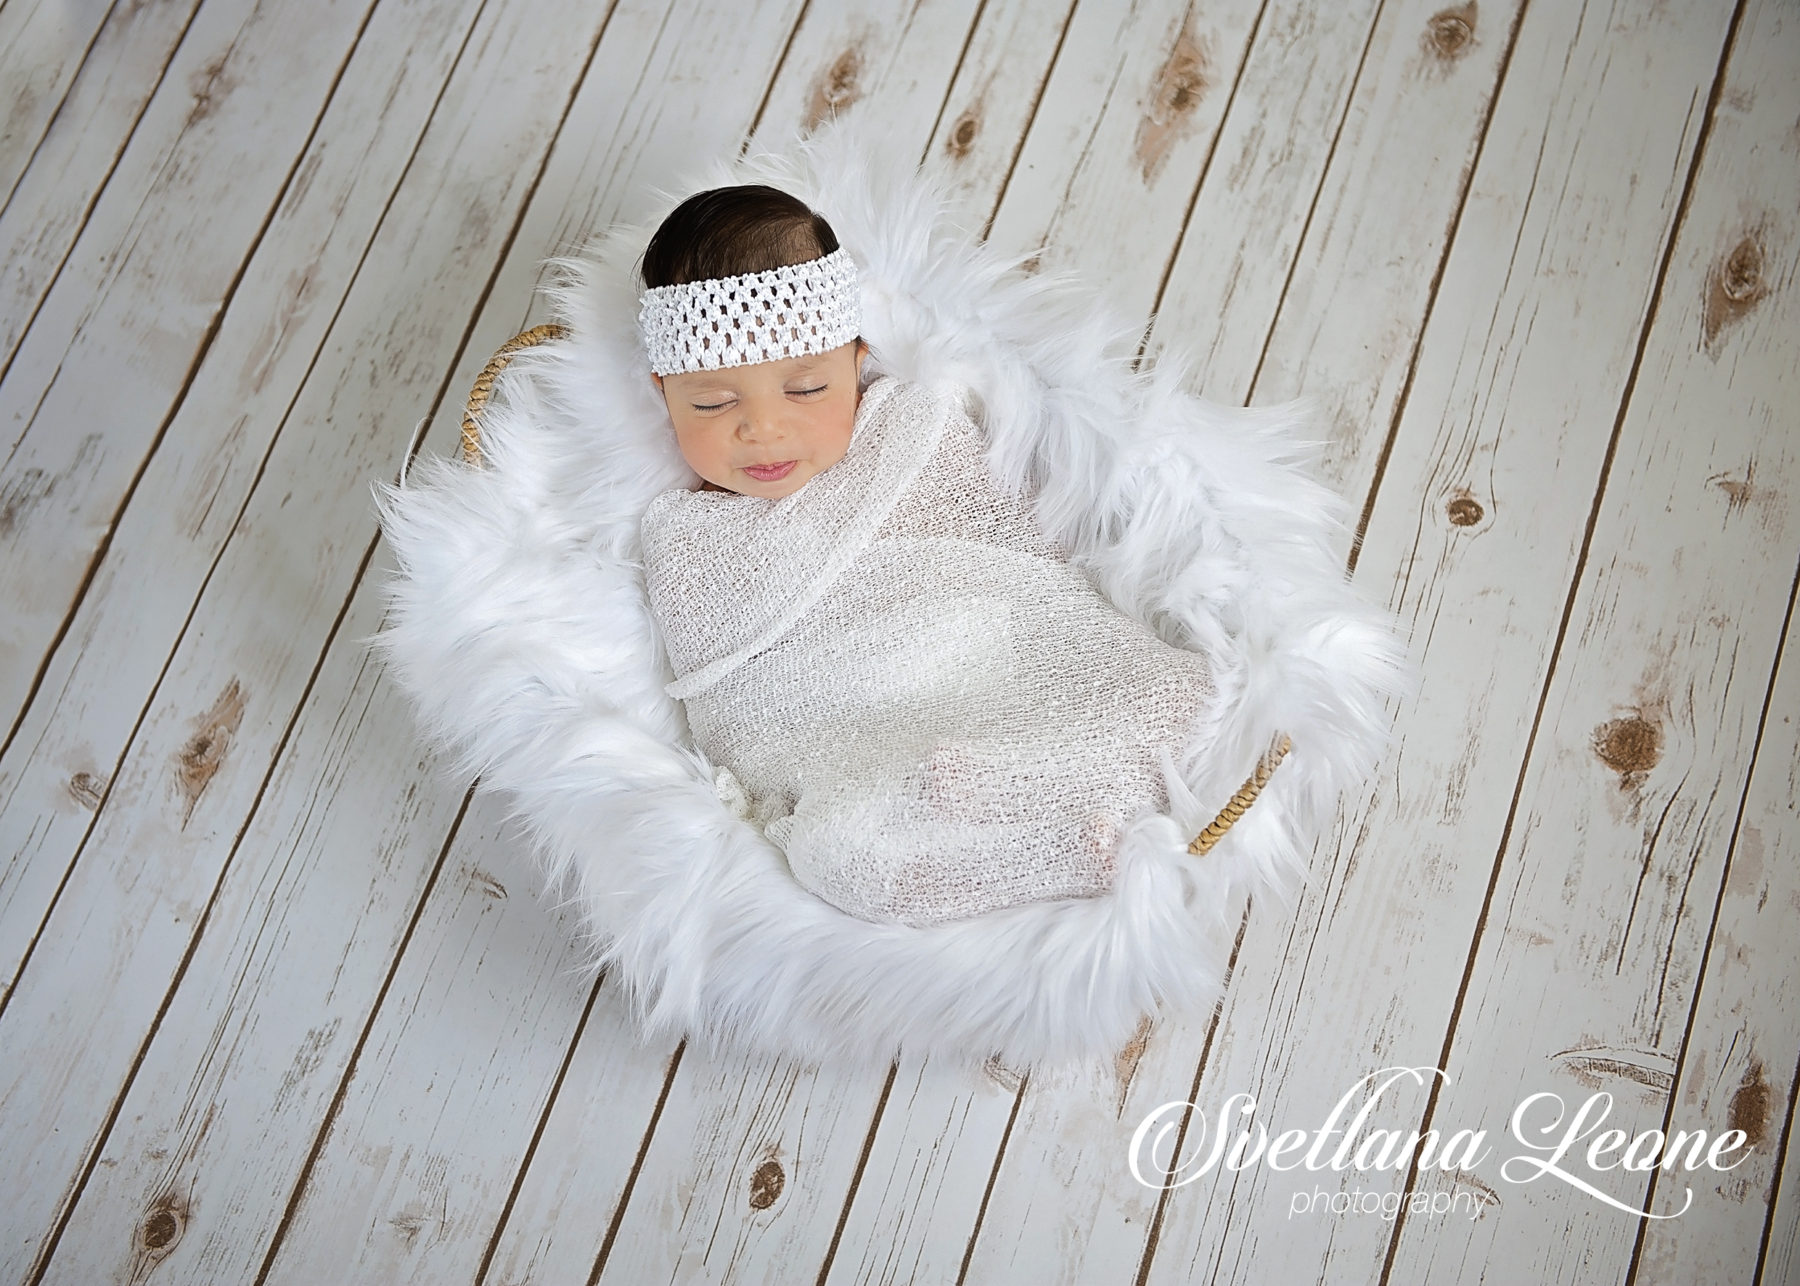 Jupiter Baby Photographer: Studio Photo Session